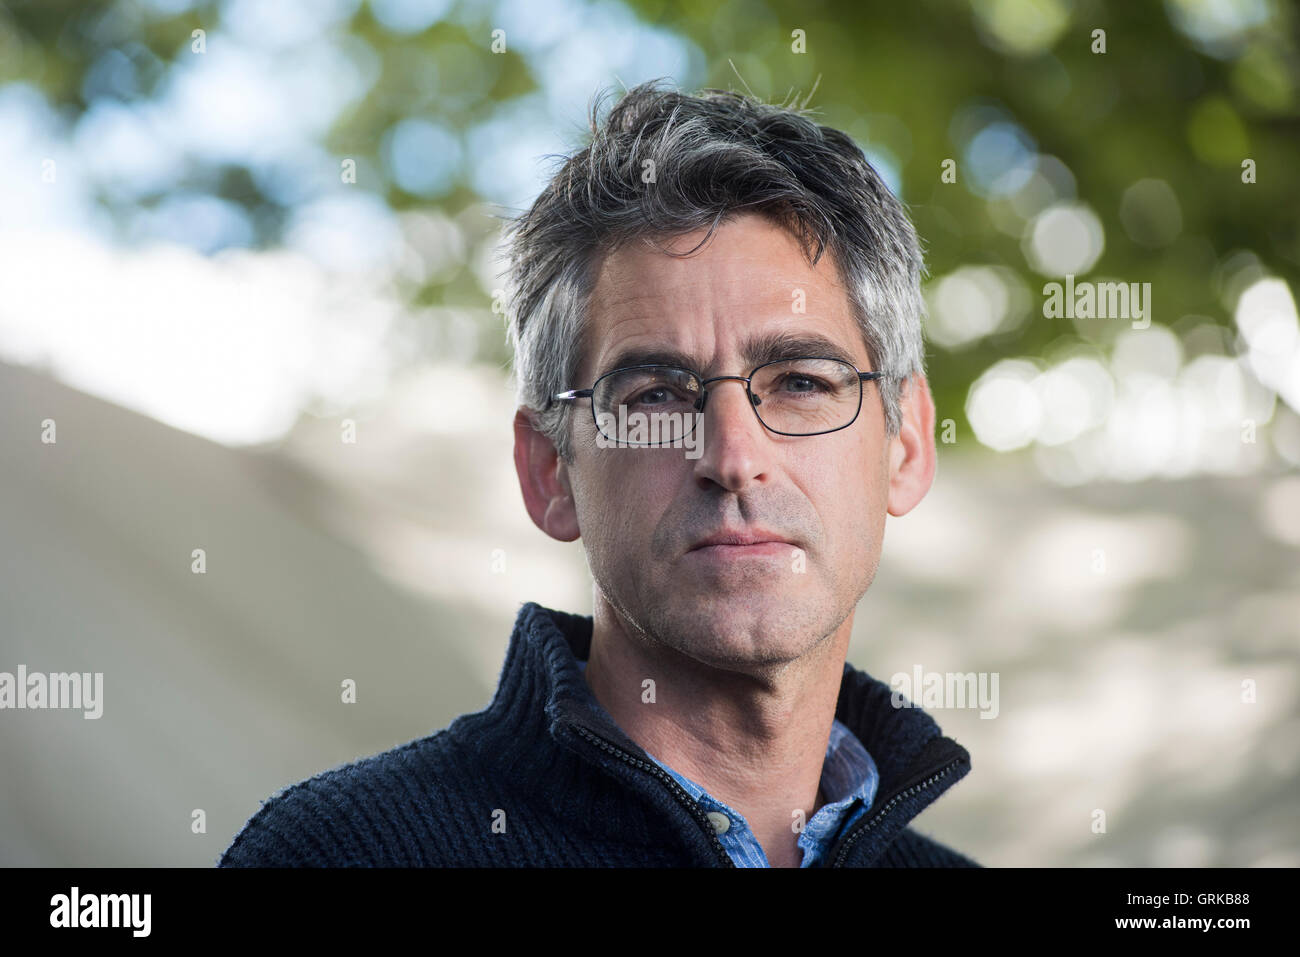 British writer Dan Boothby. - Stock Image